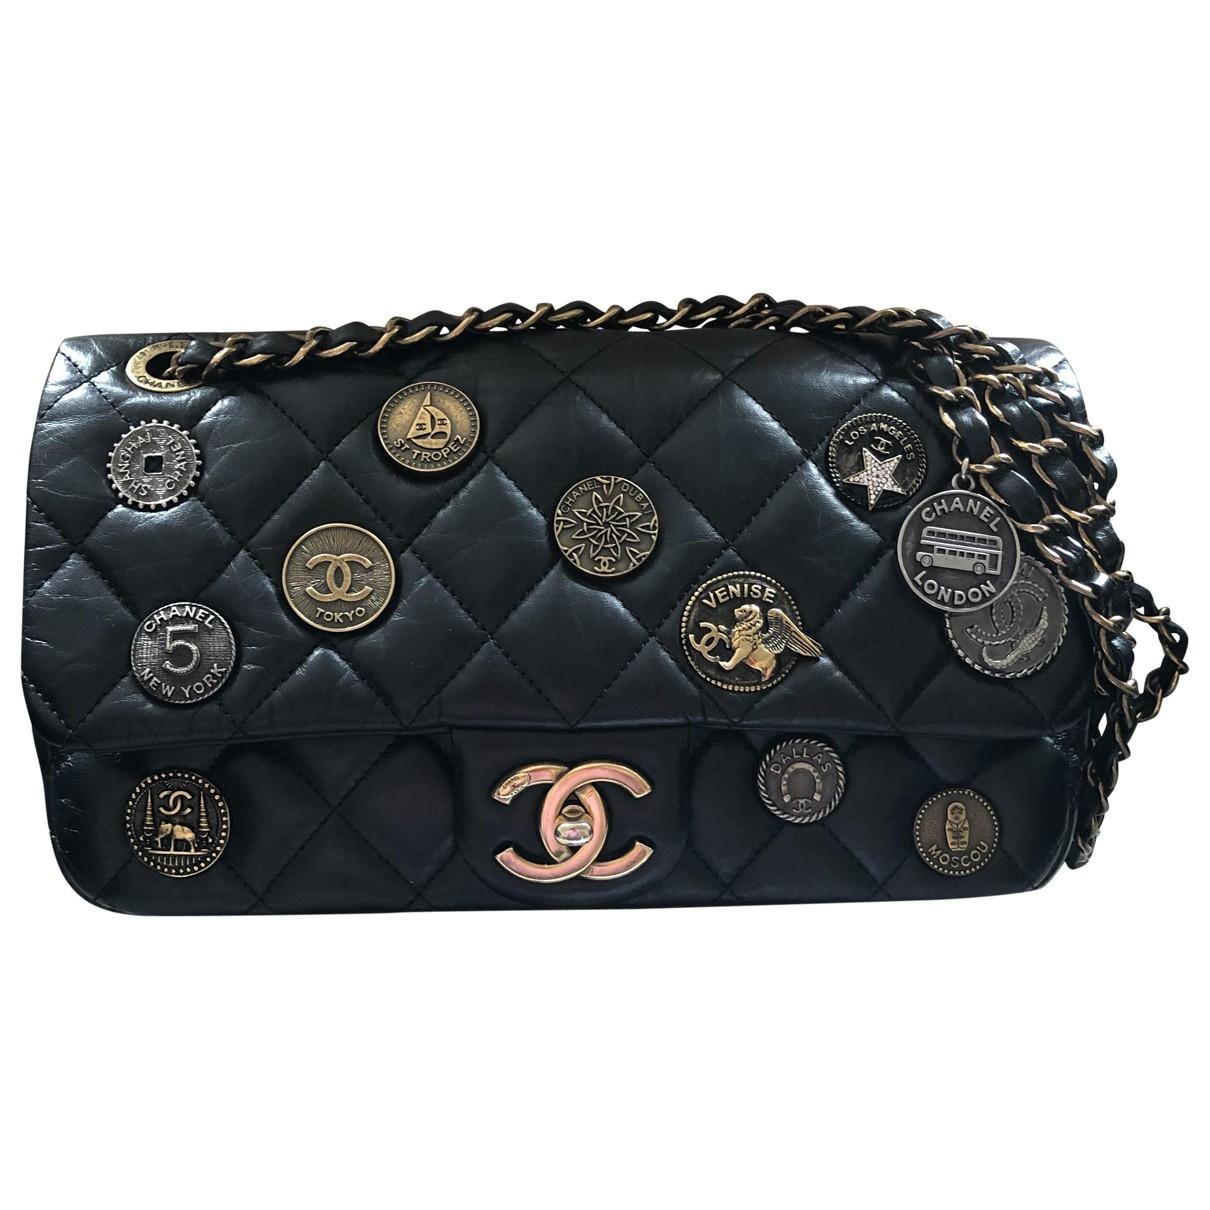 Bolso  Timeless/Classique de Cuero Chanel